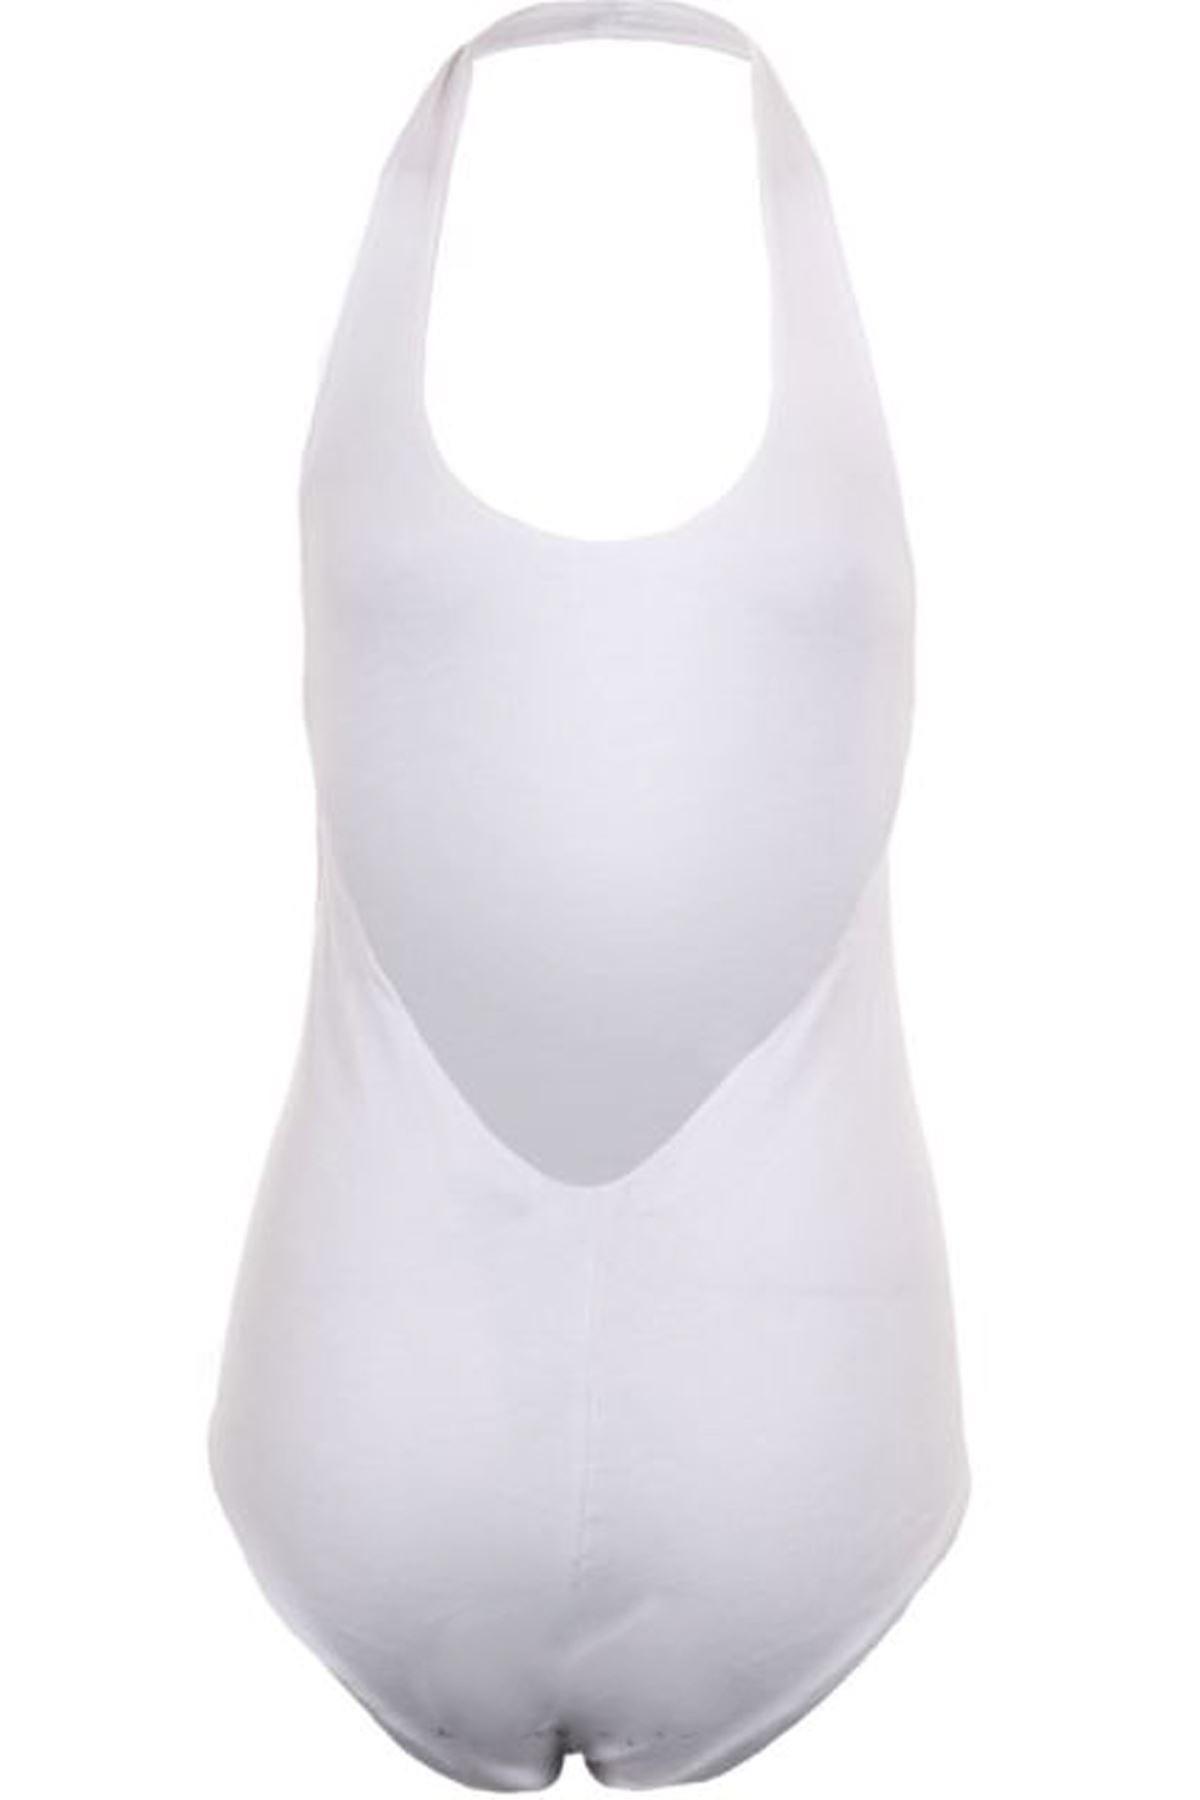 Ladies Halterneck Low Back Black Tartan Checked Women's Leotard Bodysuit Top